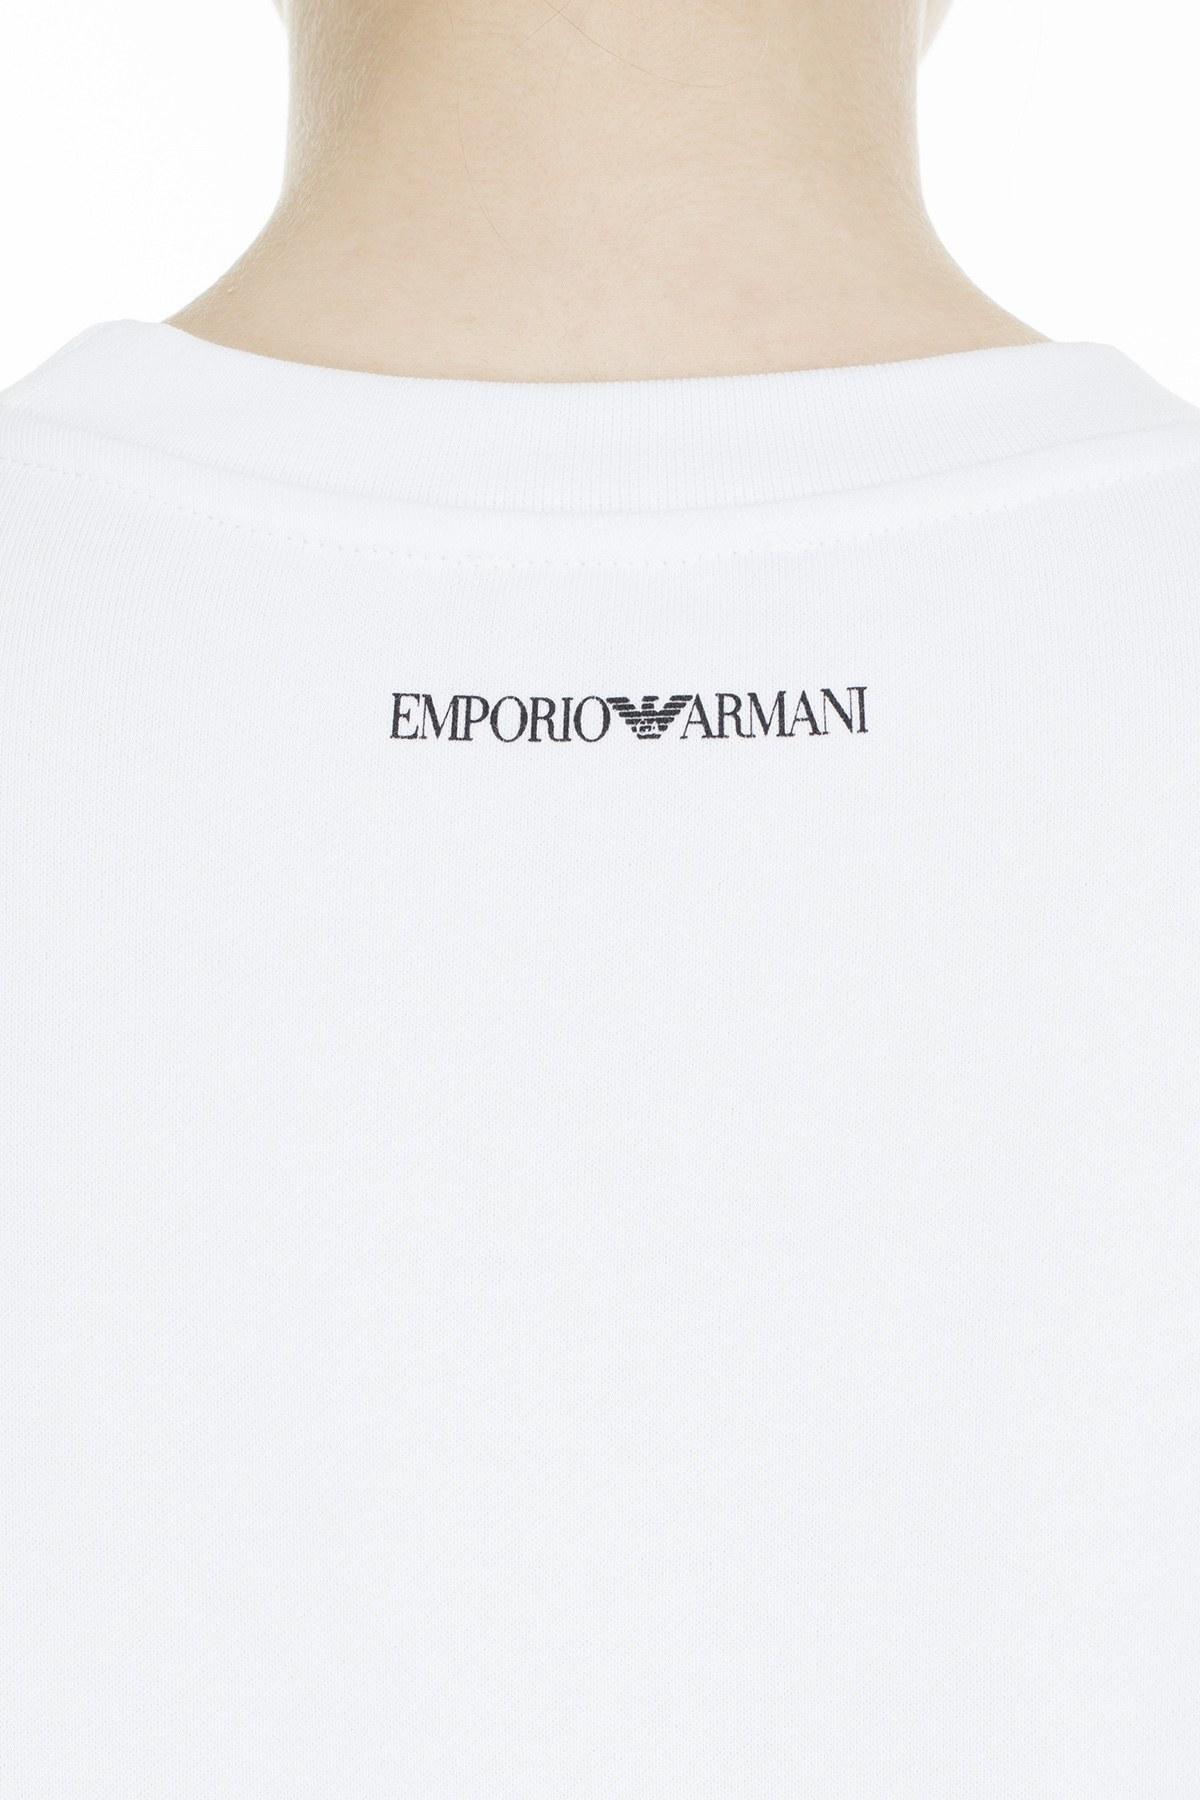 Emporio Armani Kadın Sweat S 6G2M7P 2J49Z 0100 BEYAZ